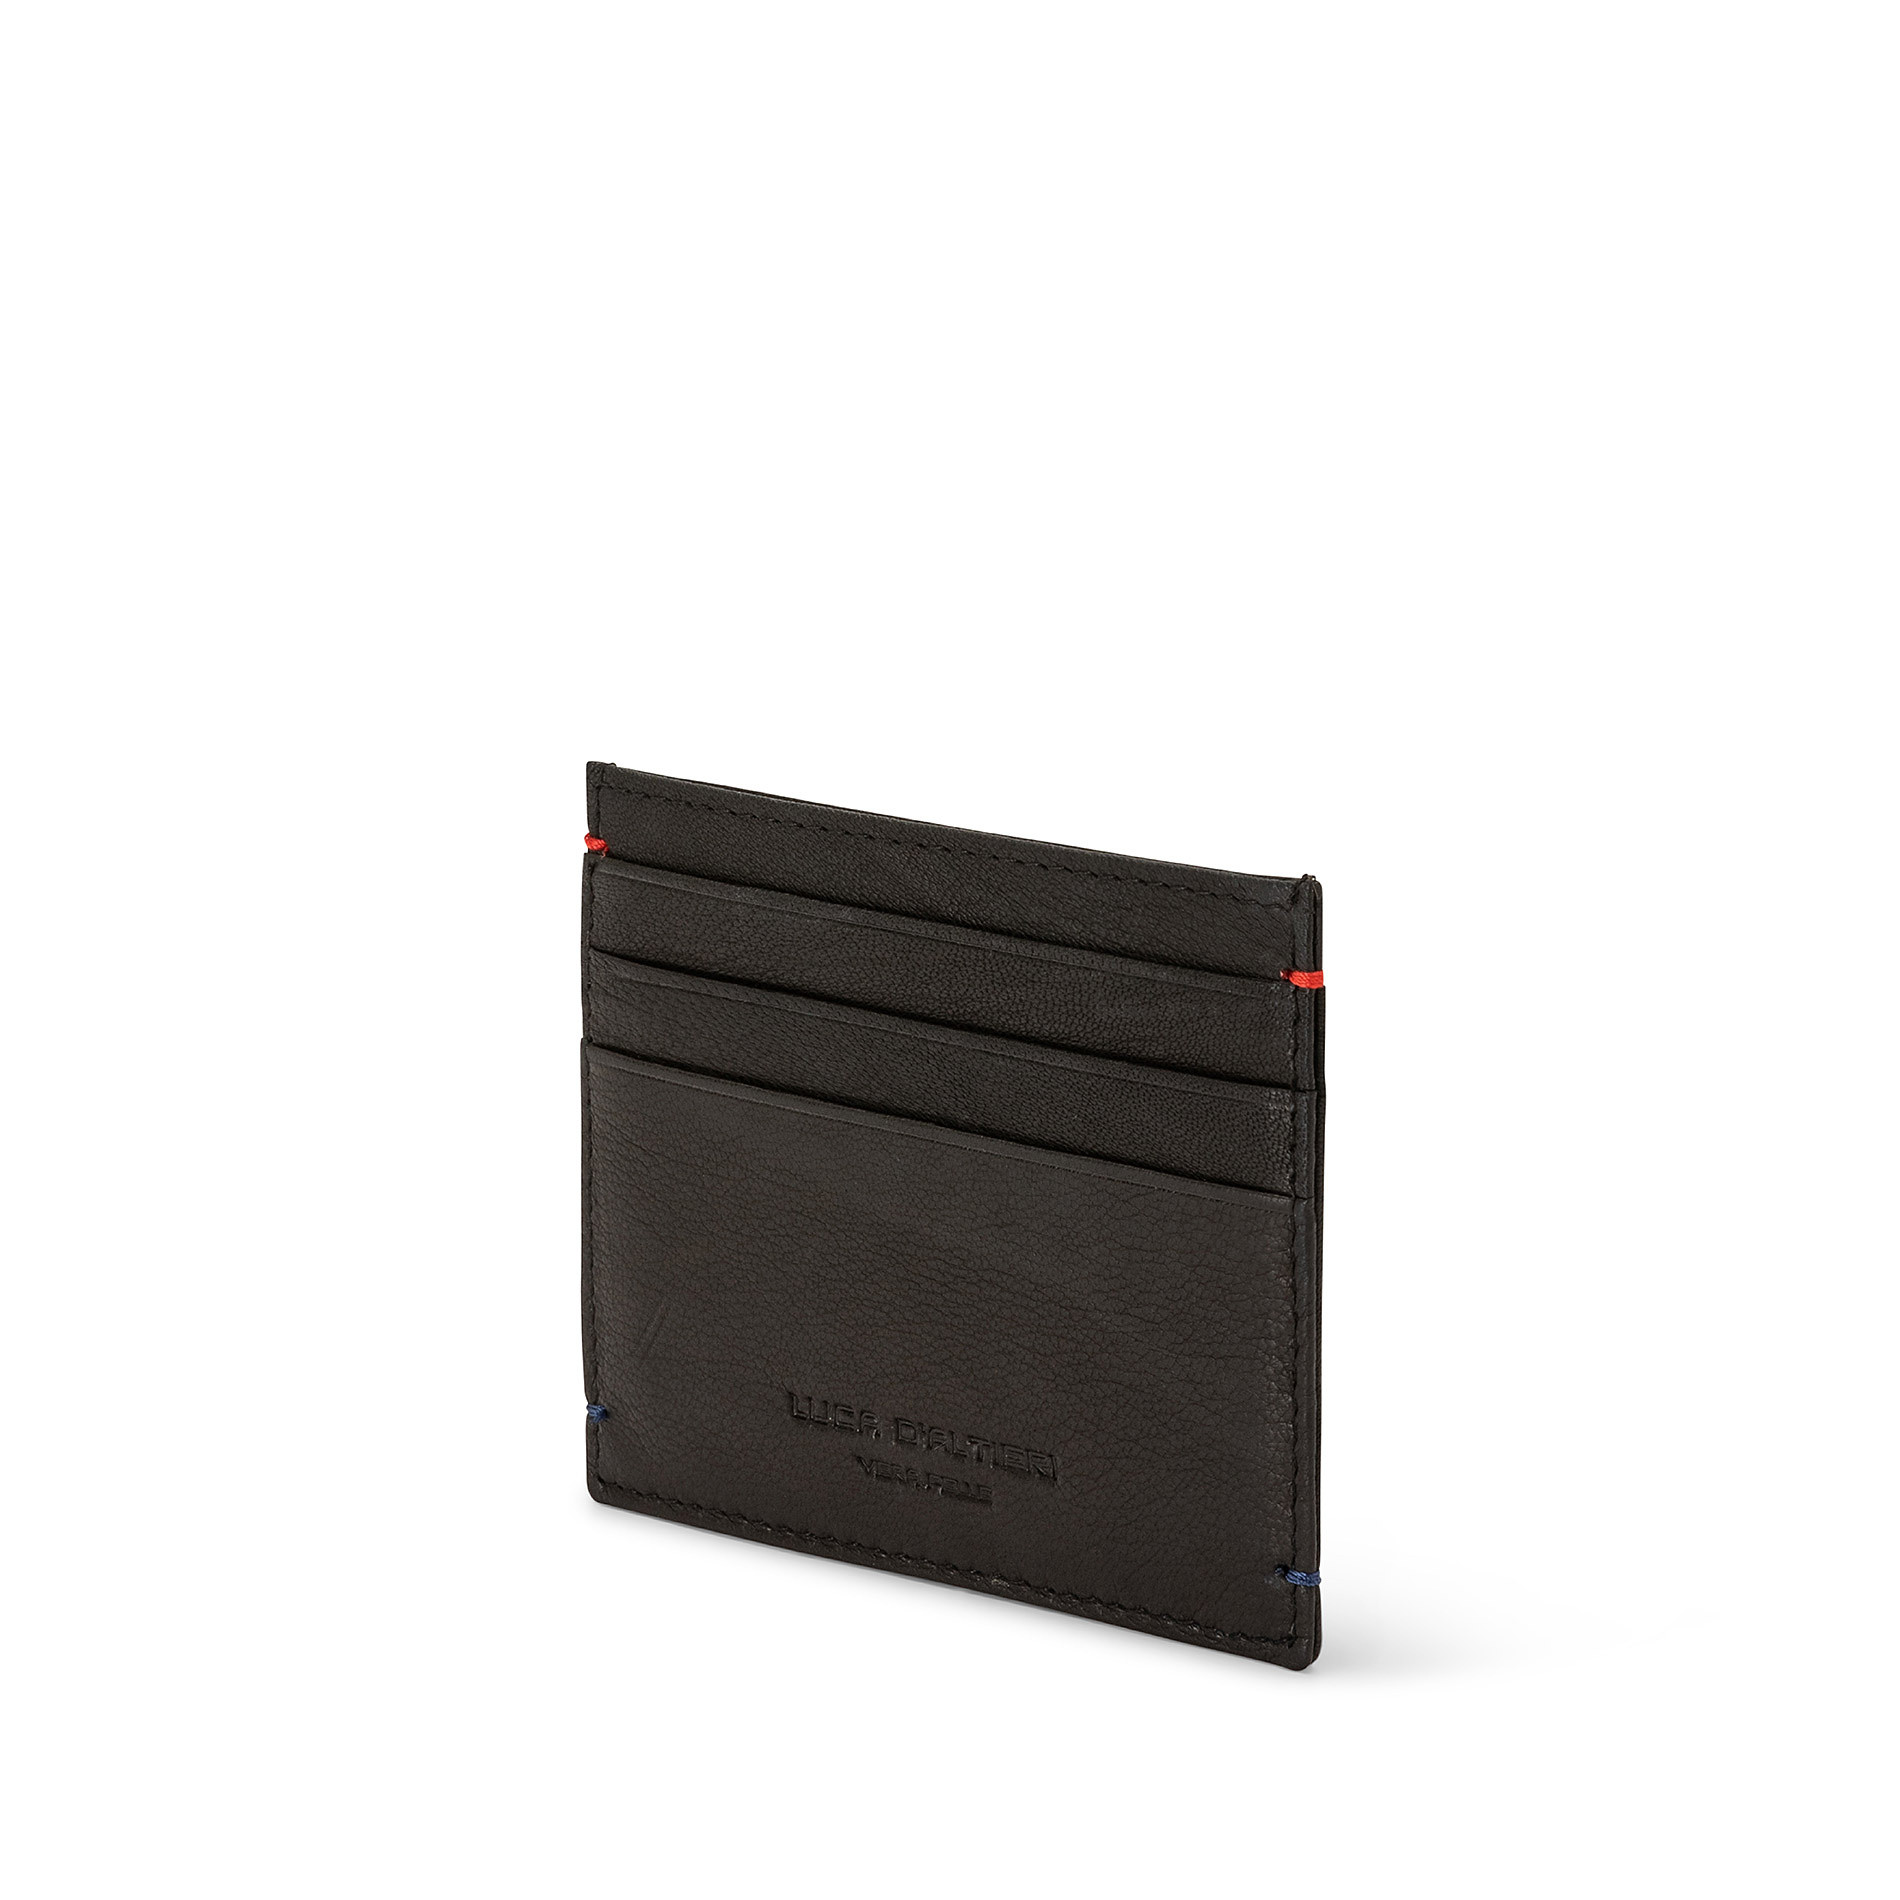 Porta carte di credito in pelle Luca D'Altieri, Nero, large image number 1